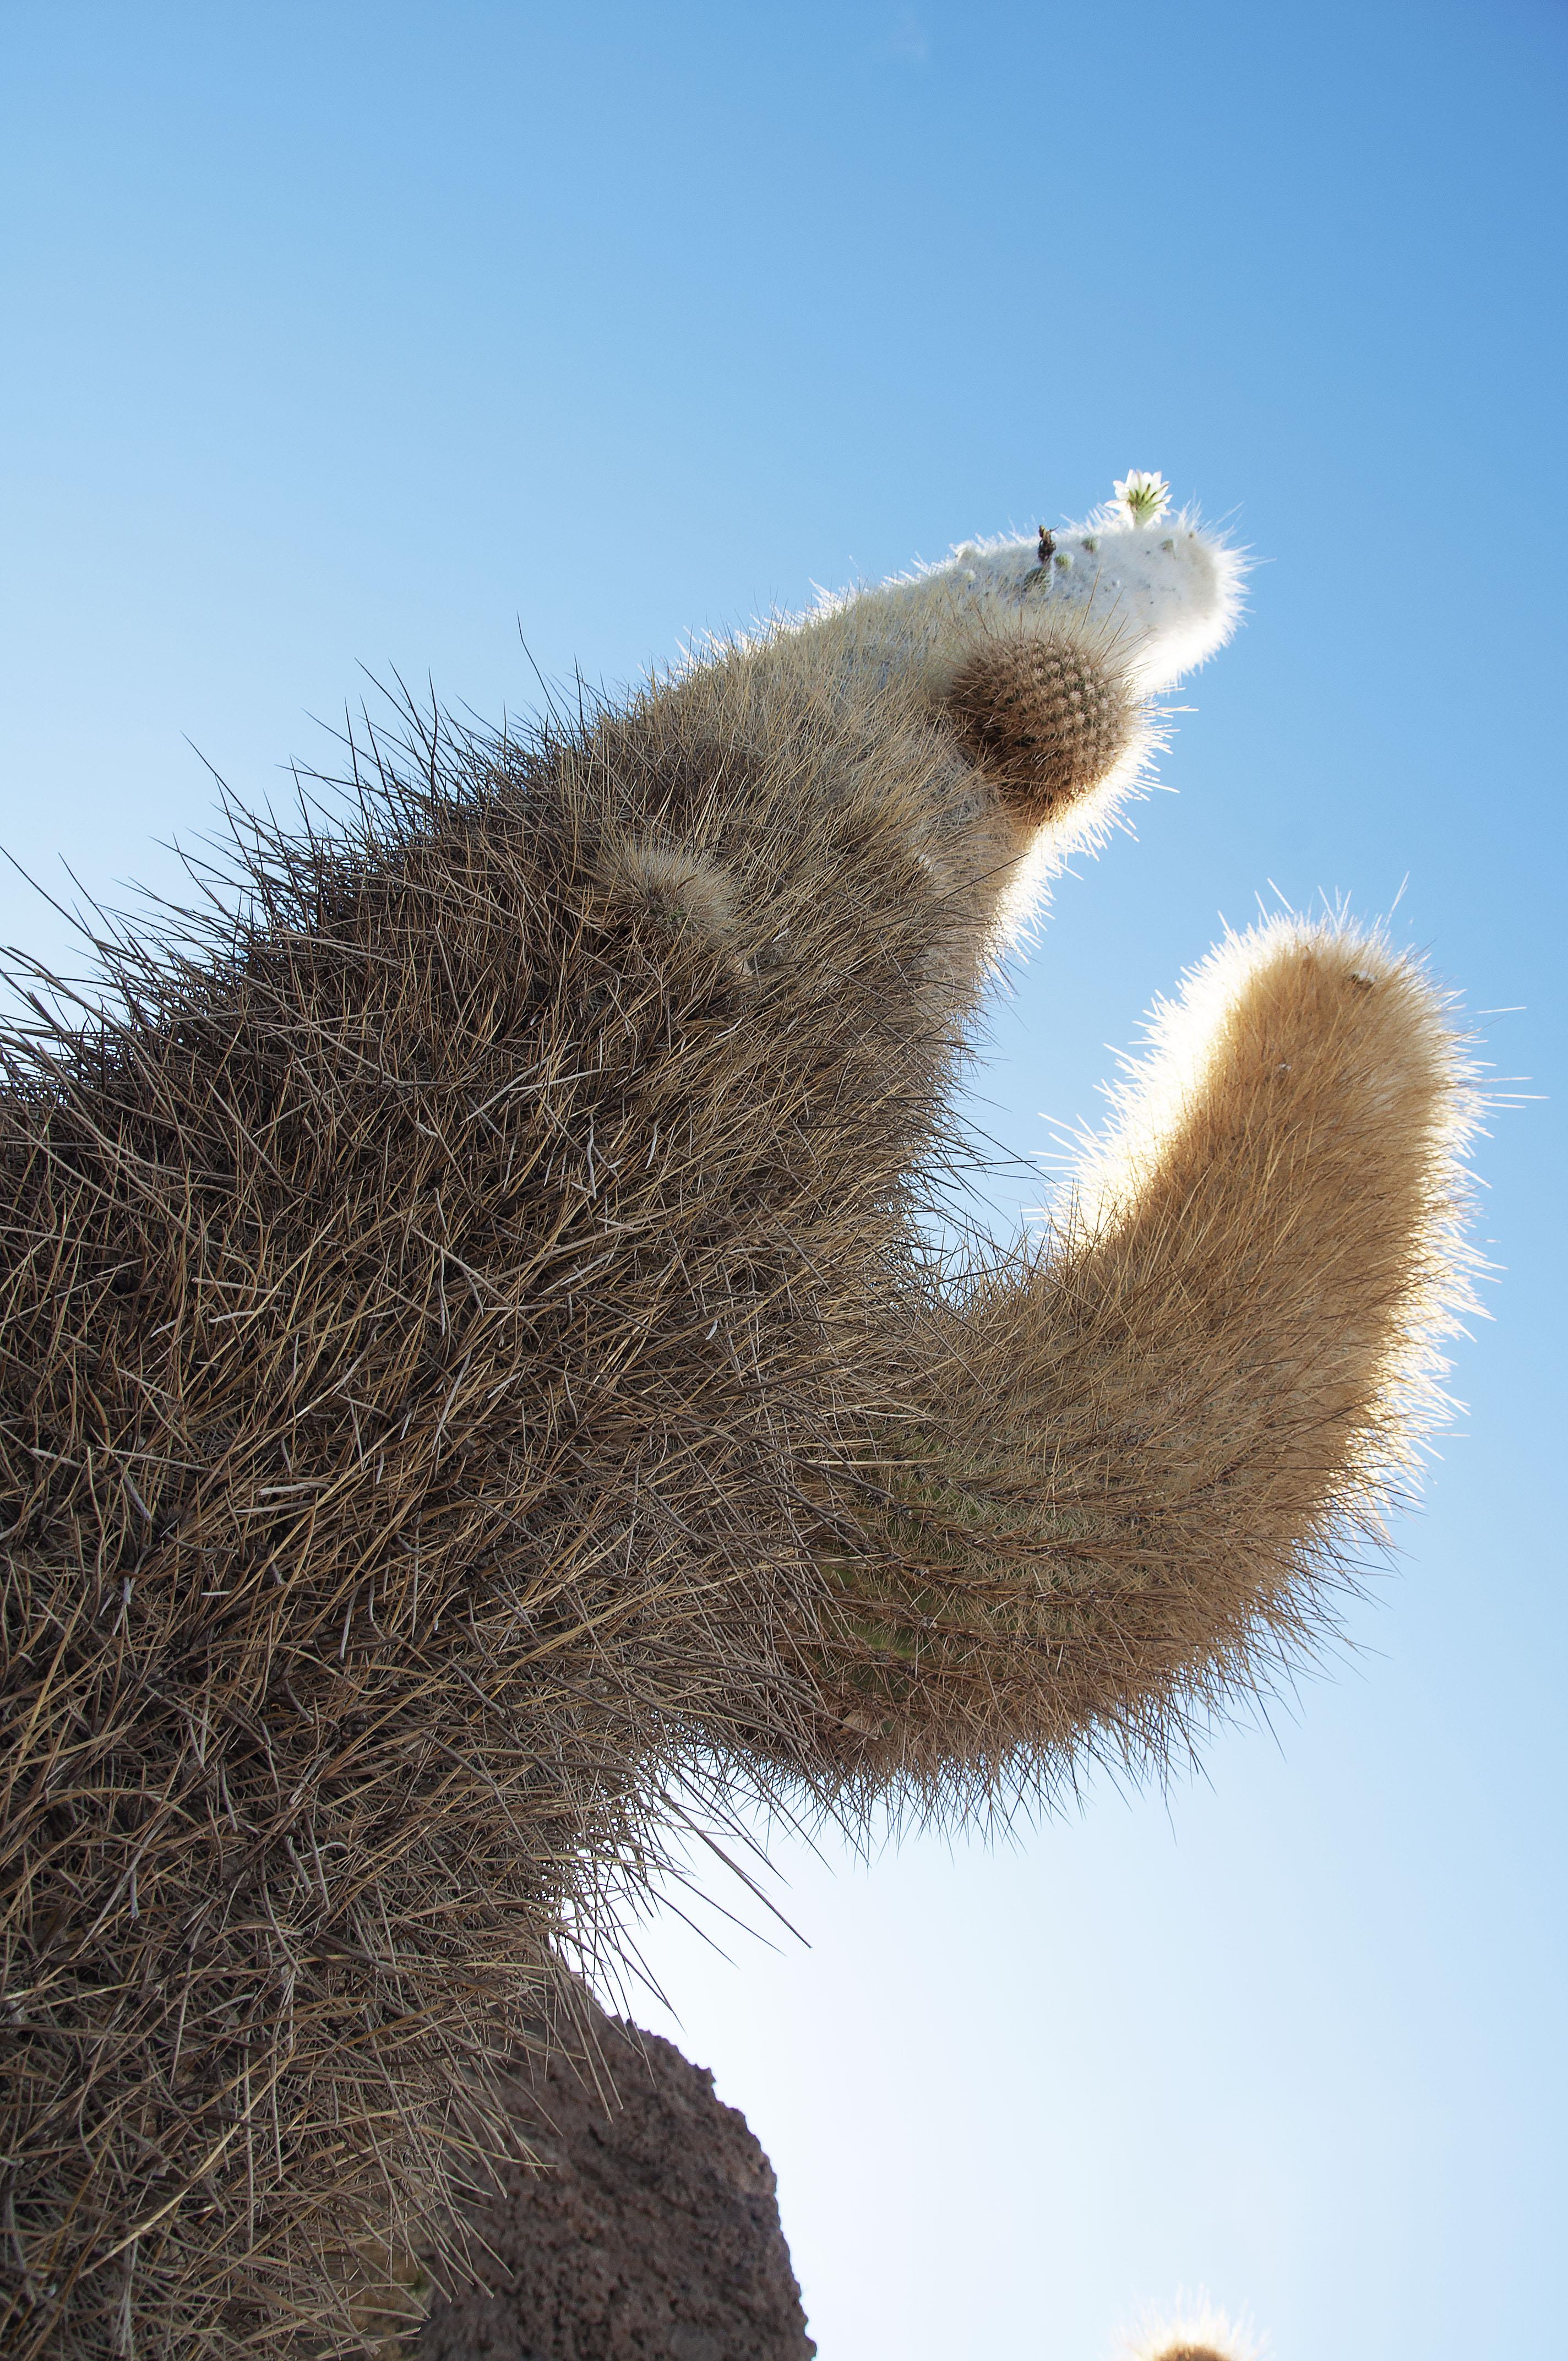 Giant Cactus, Uyuni Salt Flats